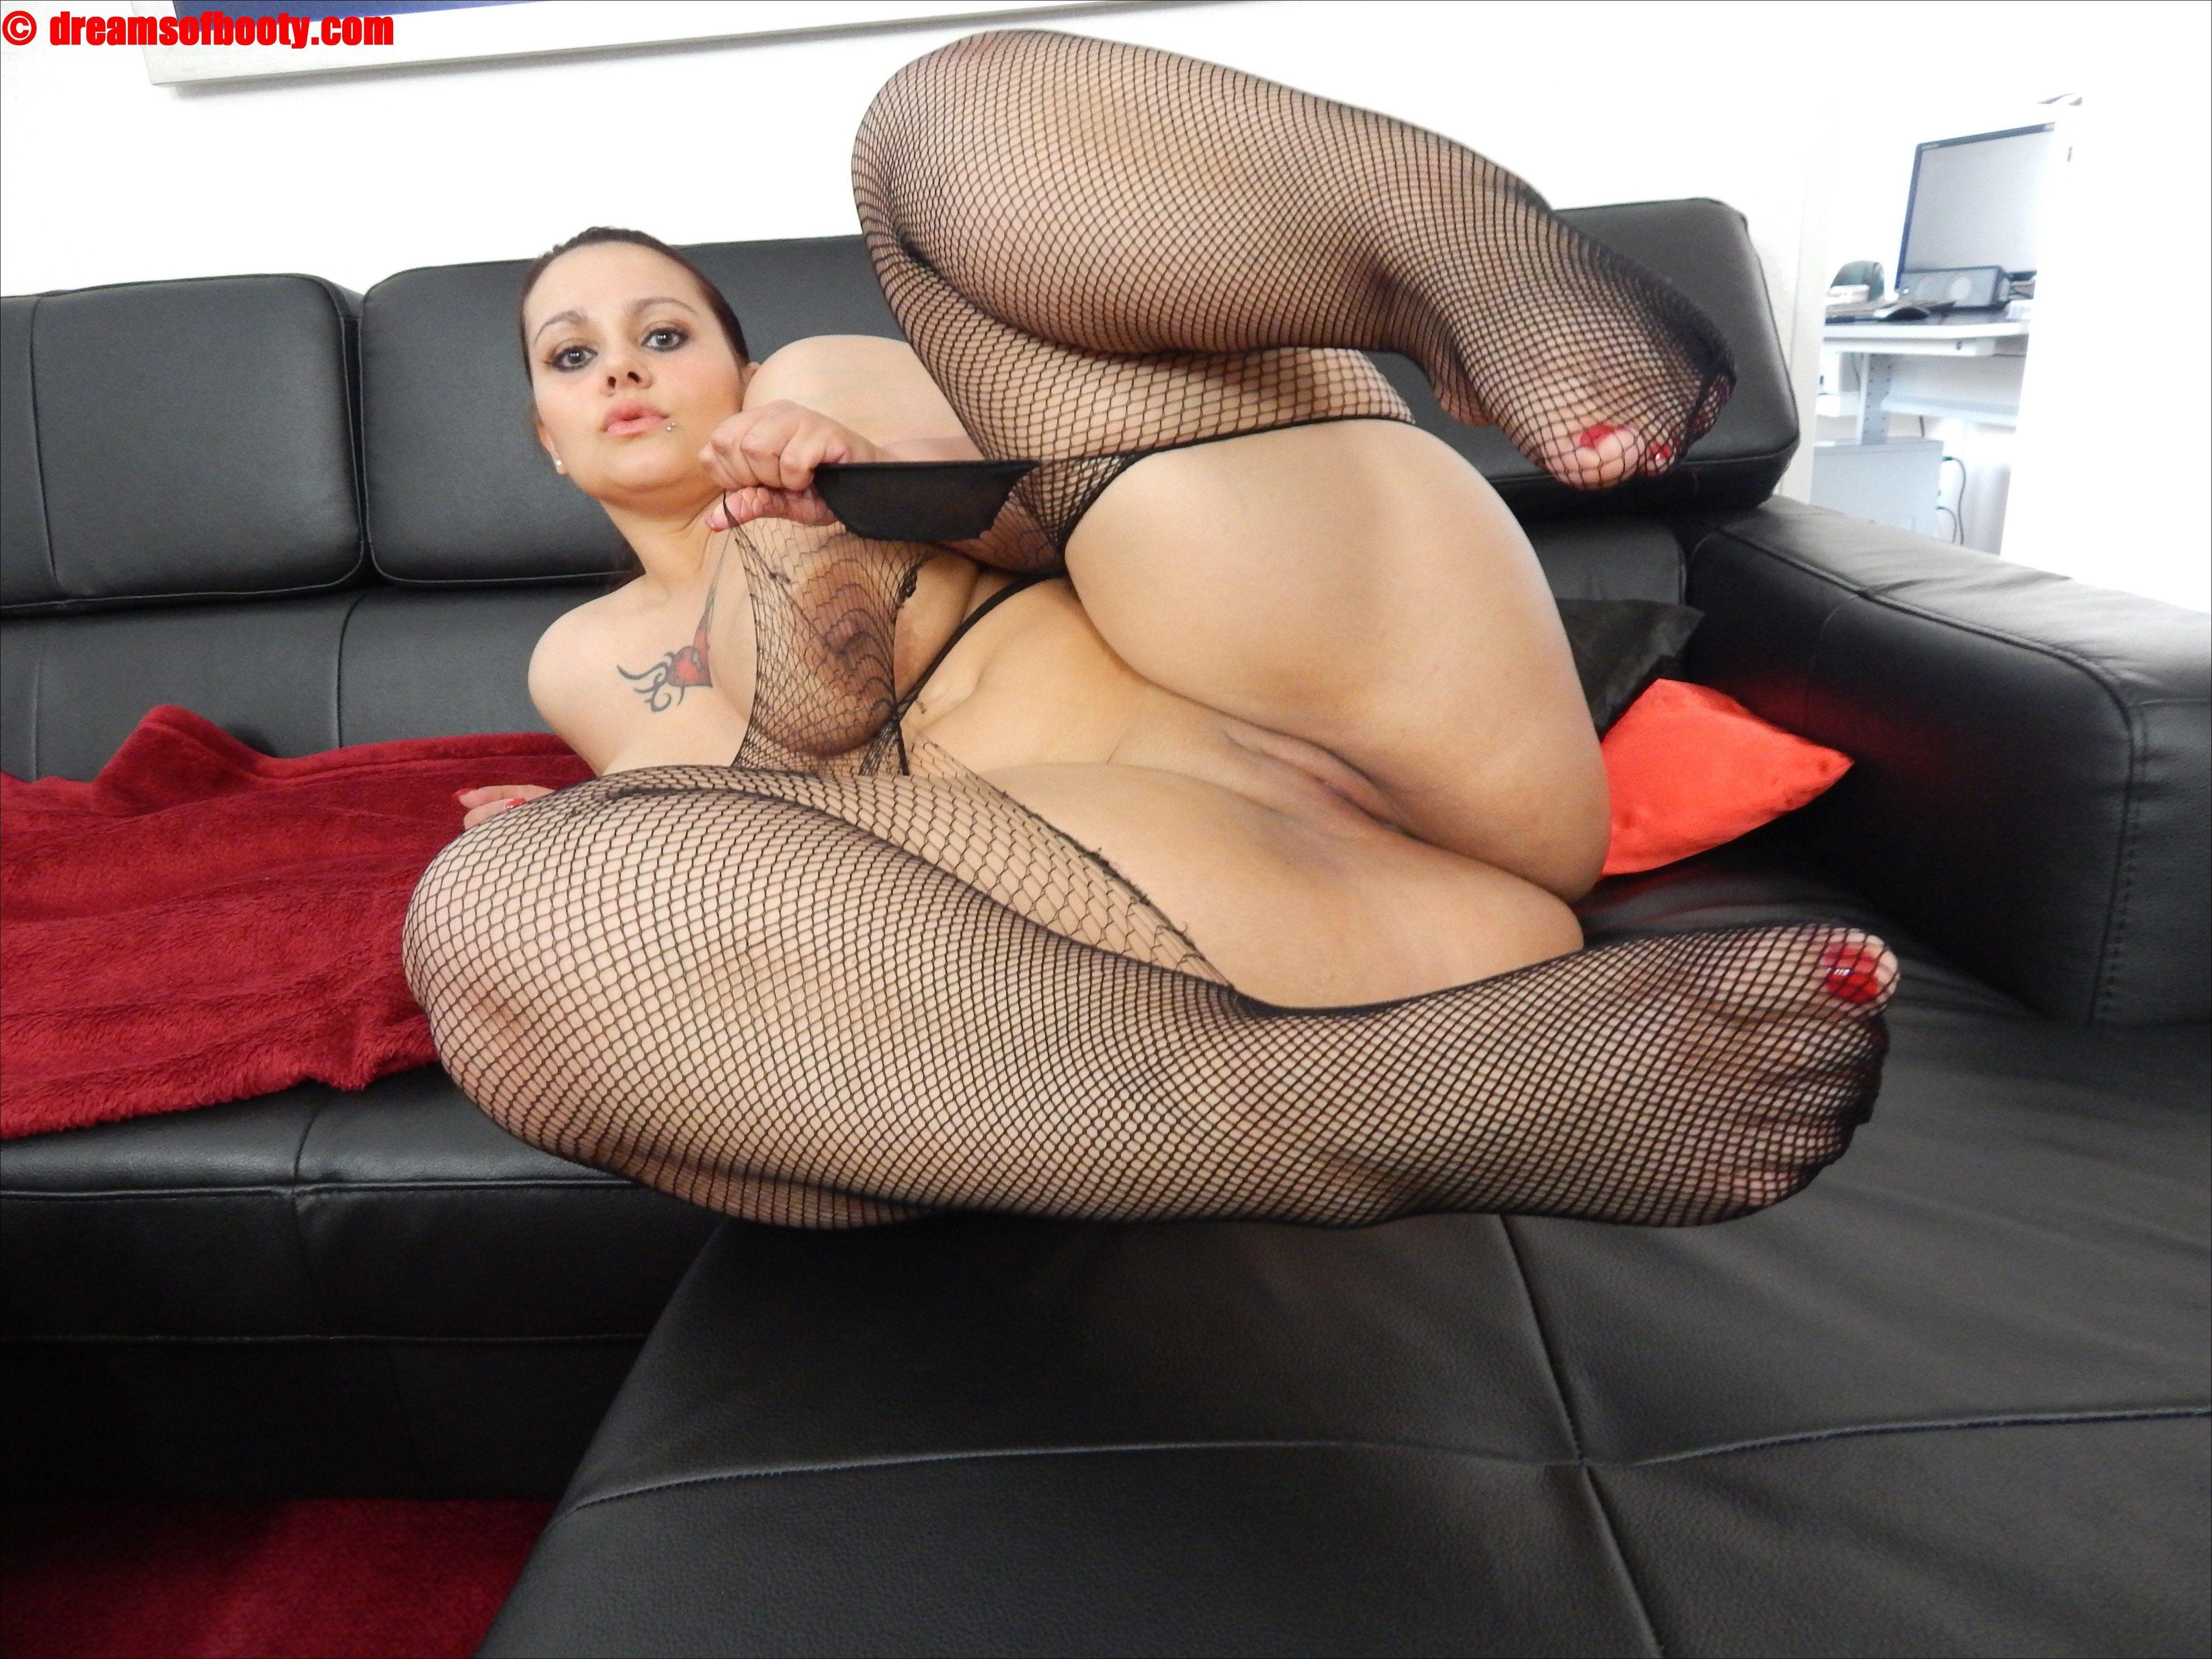 Natalie zea sex scene video clip